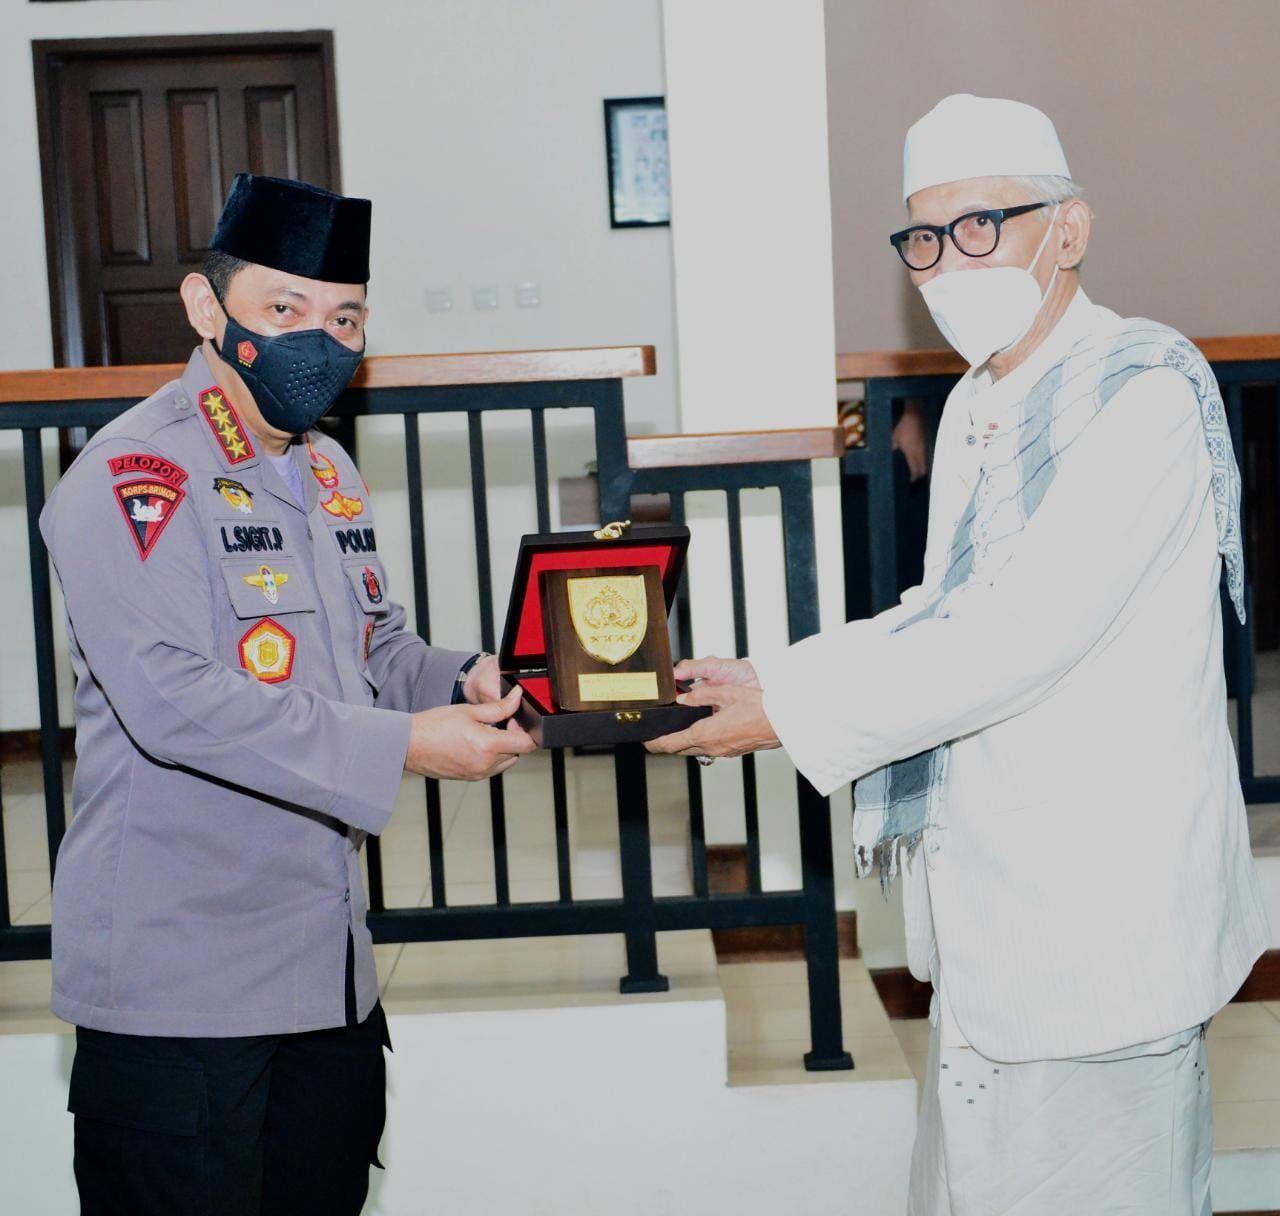 Kapolri Jenderal Listyo Sigit Prabowo melakukan kunjungan ke kediaman Ketua Umum Majelis Ulama Indonesia (MUI) K.H. Miftachul Akhyar